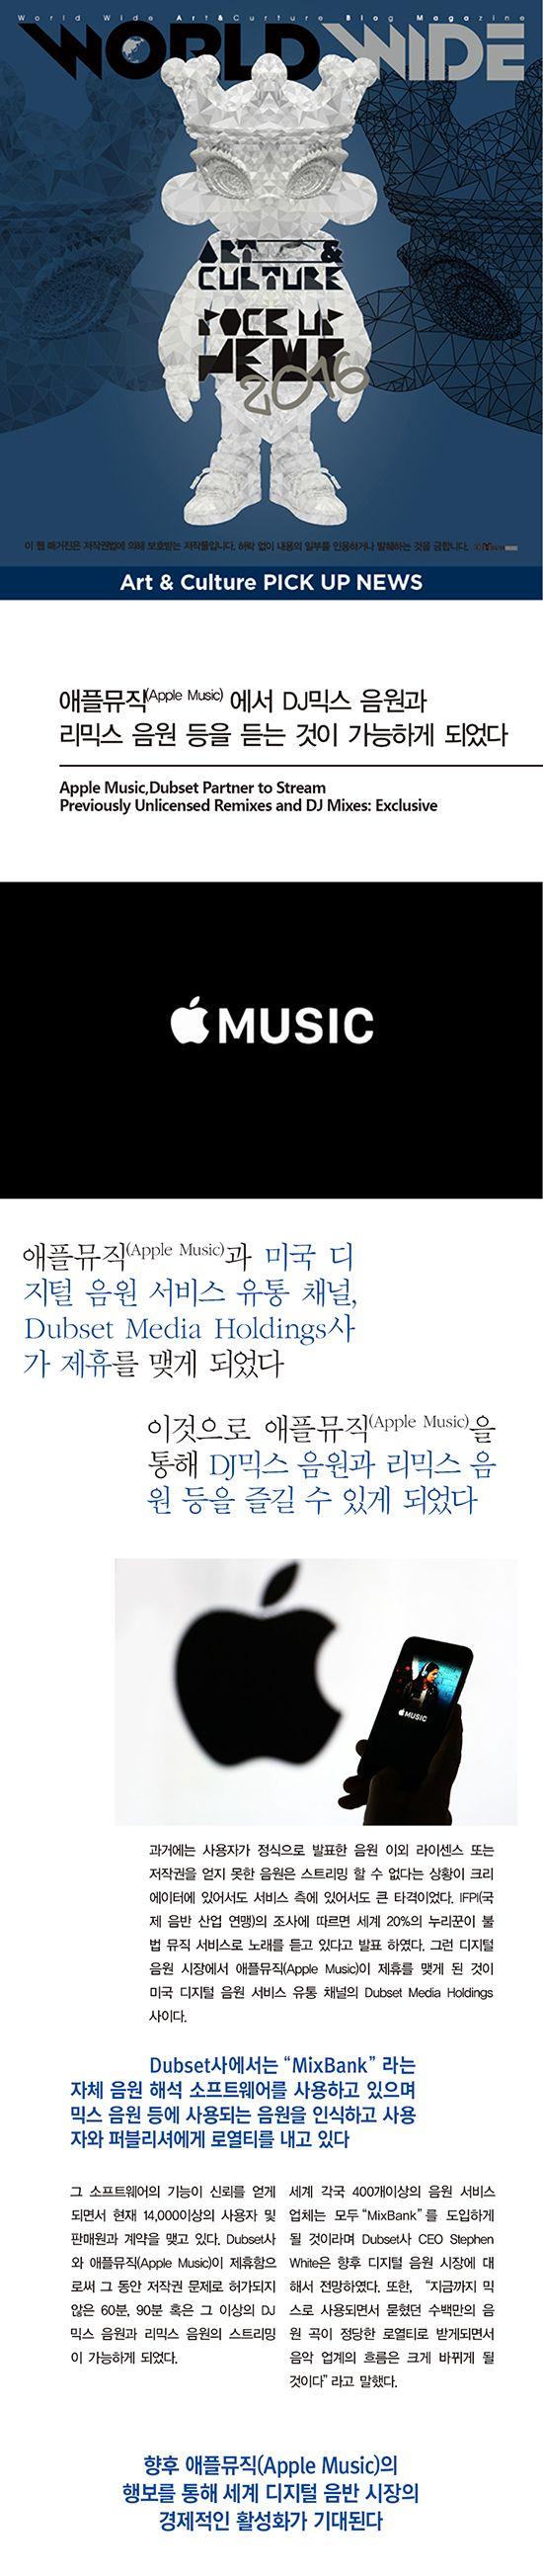 Blog Magazine ● WORLD WIDE: Art & Culture PICK UP NEWS∥애플뮤직(Apple Music)에서 DJ믹스 음원과 리믹스 음원 등을 듣는 것이 가능하게 되었다